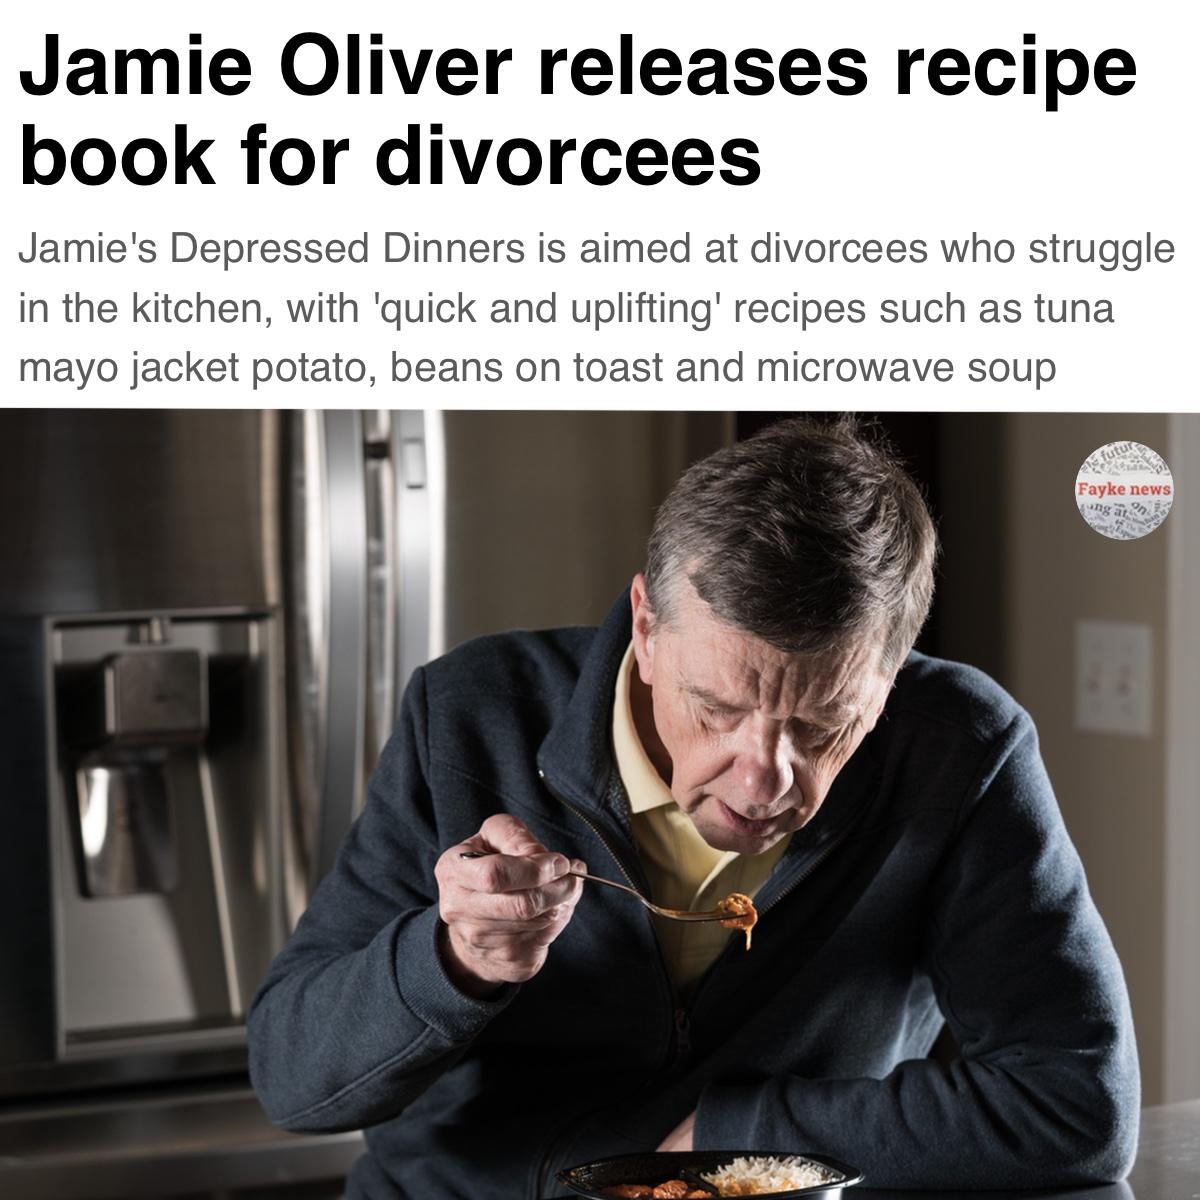 Jamie Oliver Divorcee Recipe Book Fake News Satire Meme